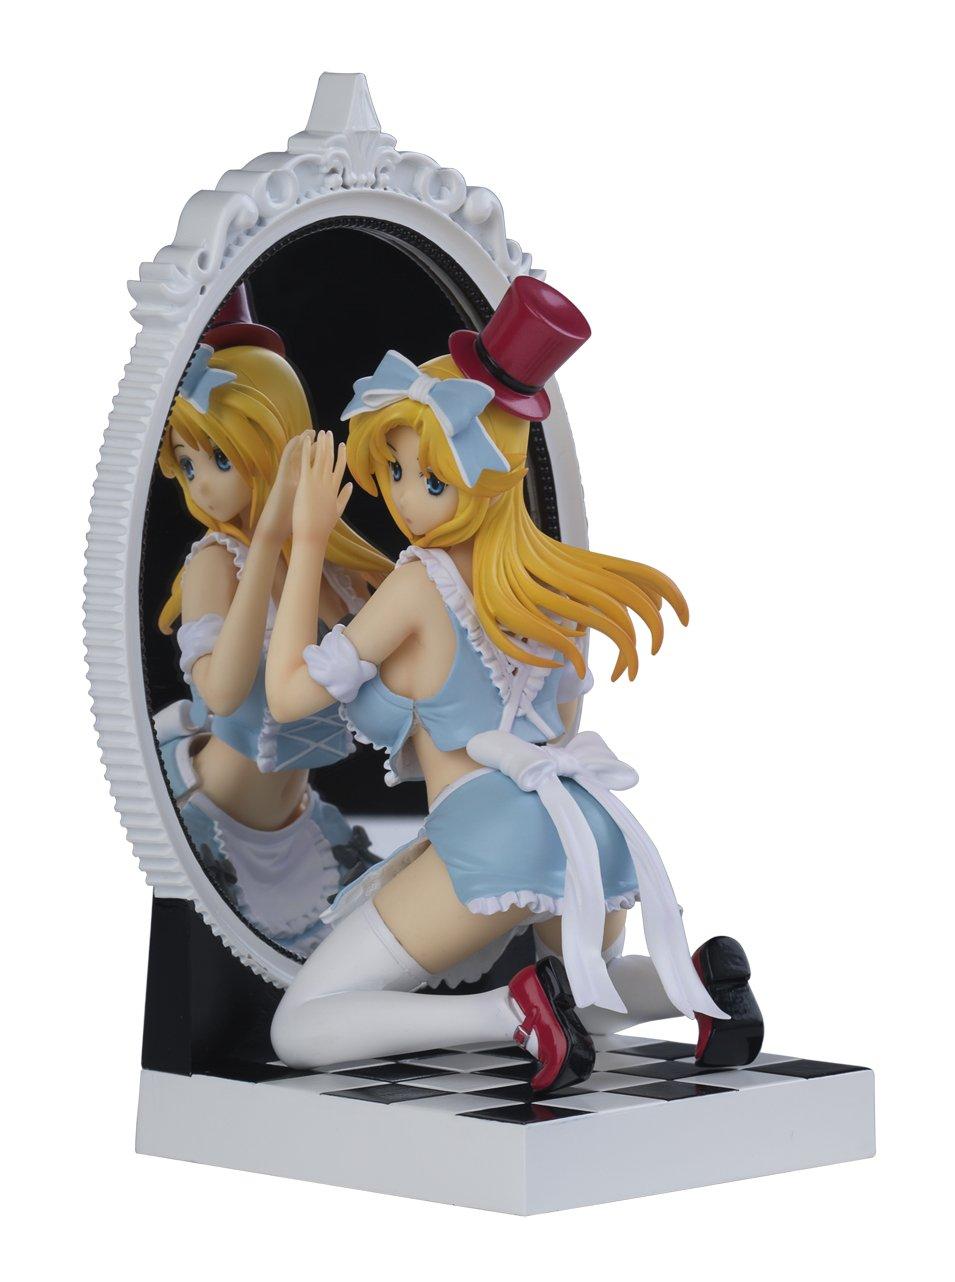 Fairy Tale Figure Vol.3 - Alice in Mirror World [blu Dress Ver.] (PVC Figure) (japan import)